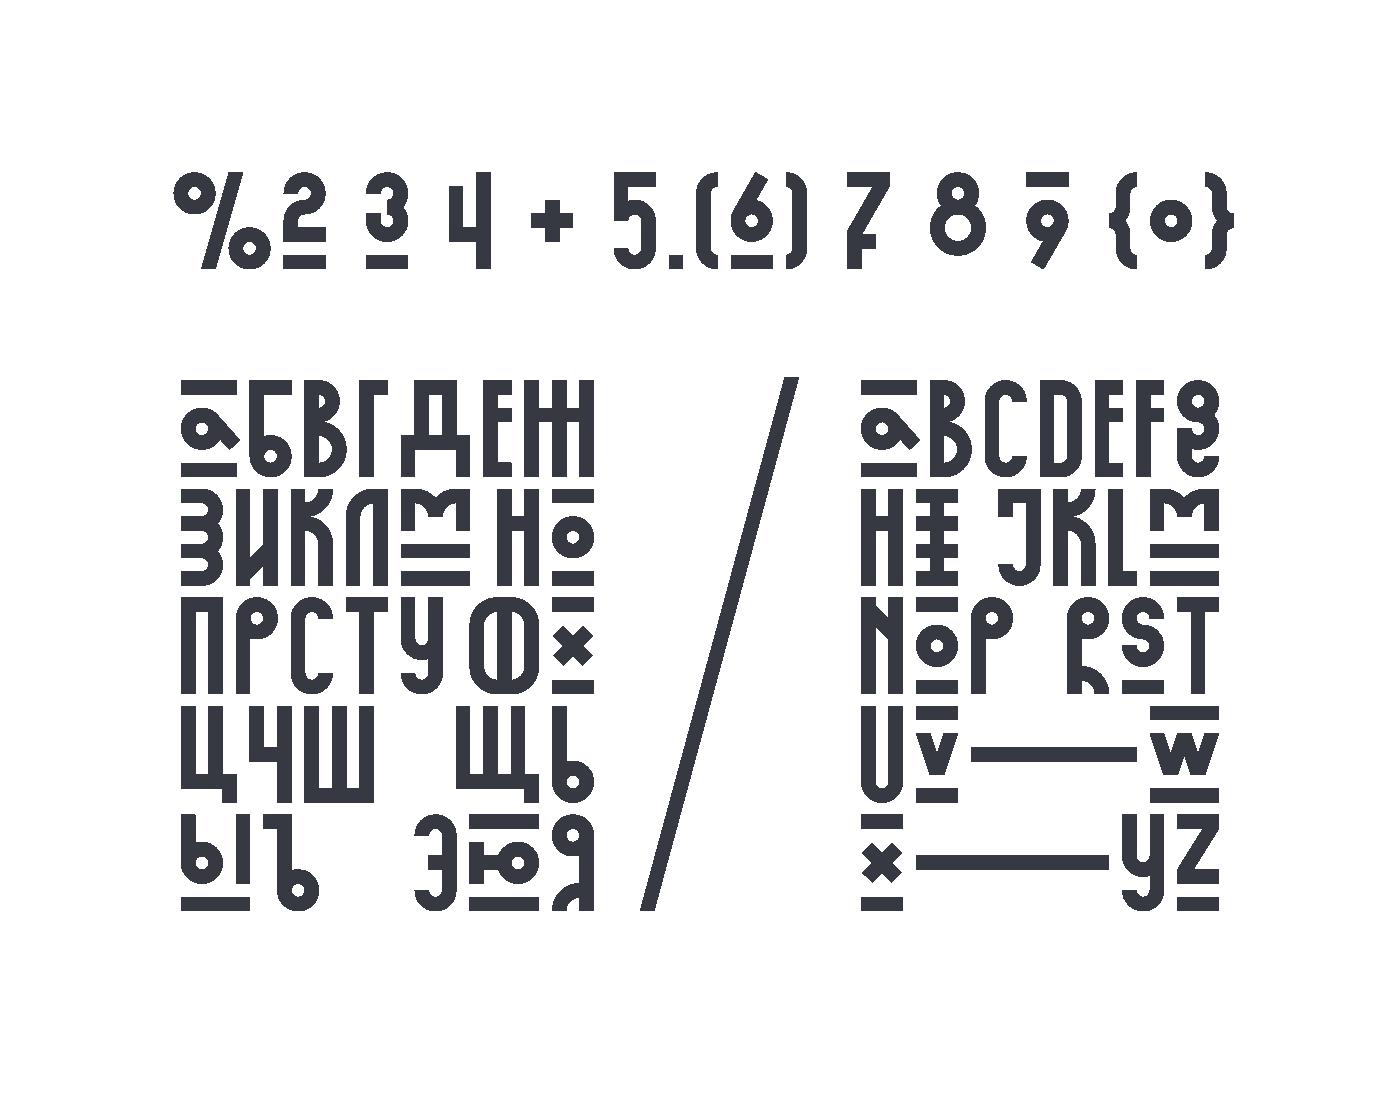 freefont free font Latin Cyrrilic кириллица шрифт буквы ligaturecollective type Typeface Russia курбанистика mishapriem bestfonts